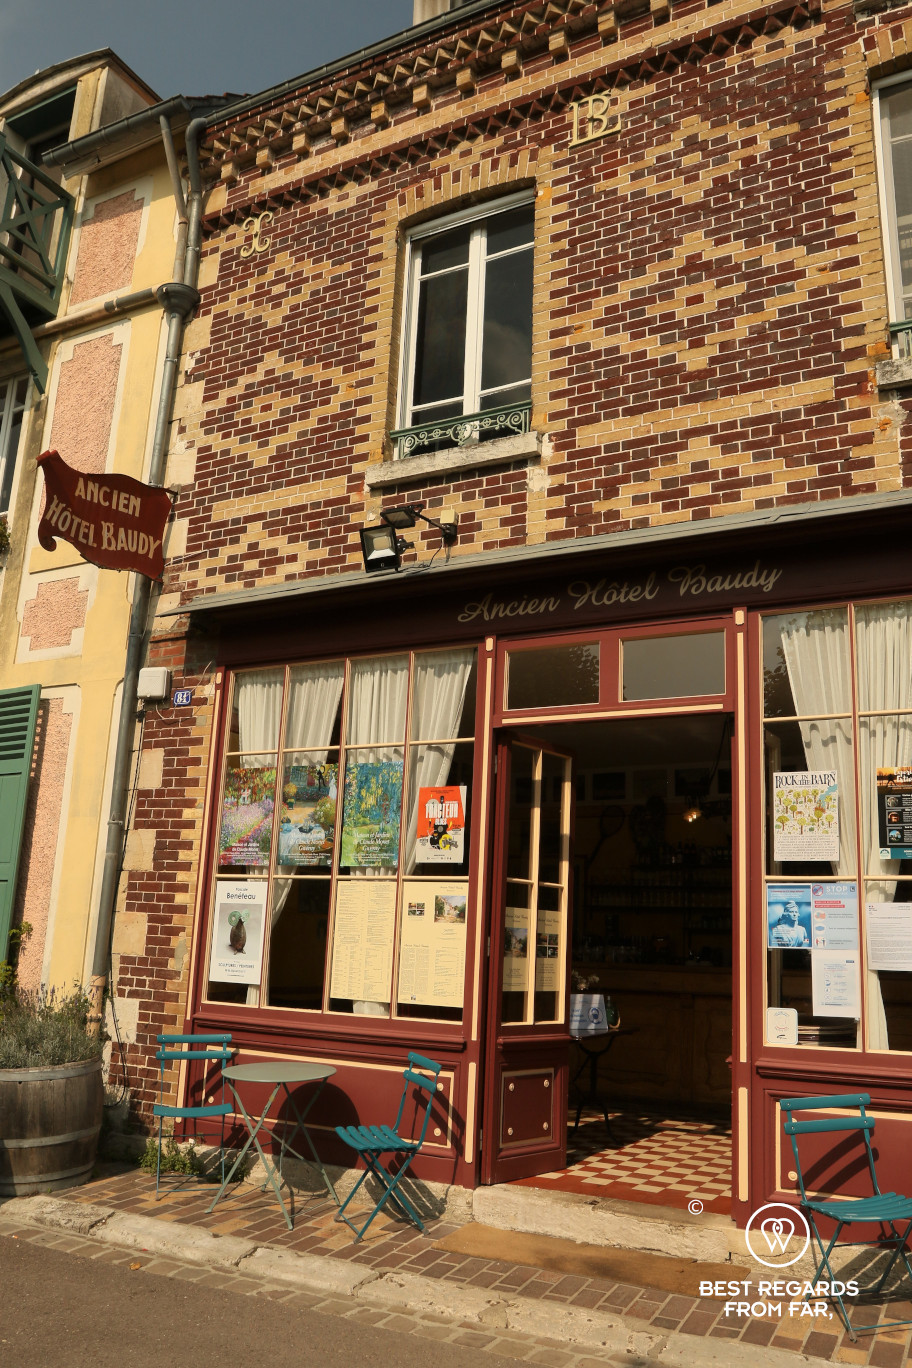 Ancien hôtel Baudy, Giverny, France